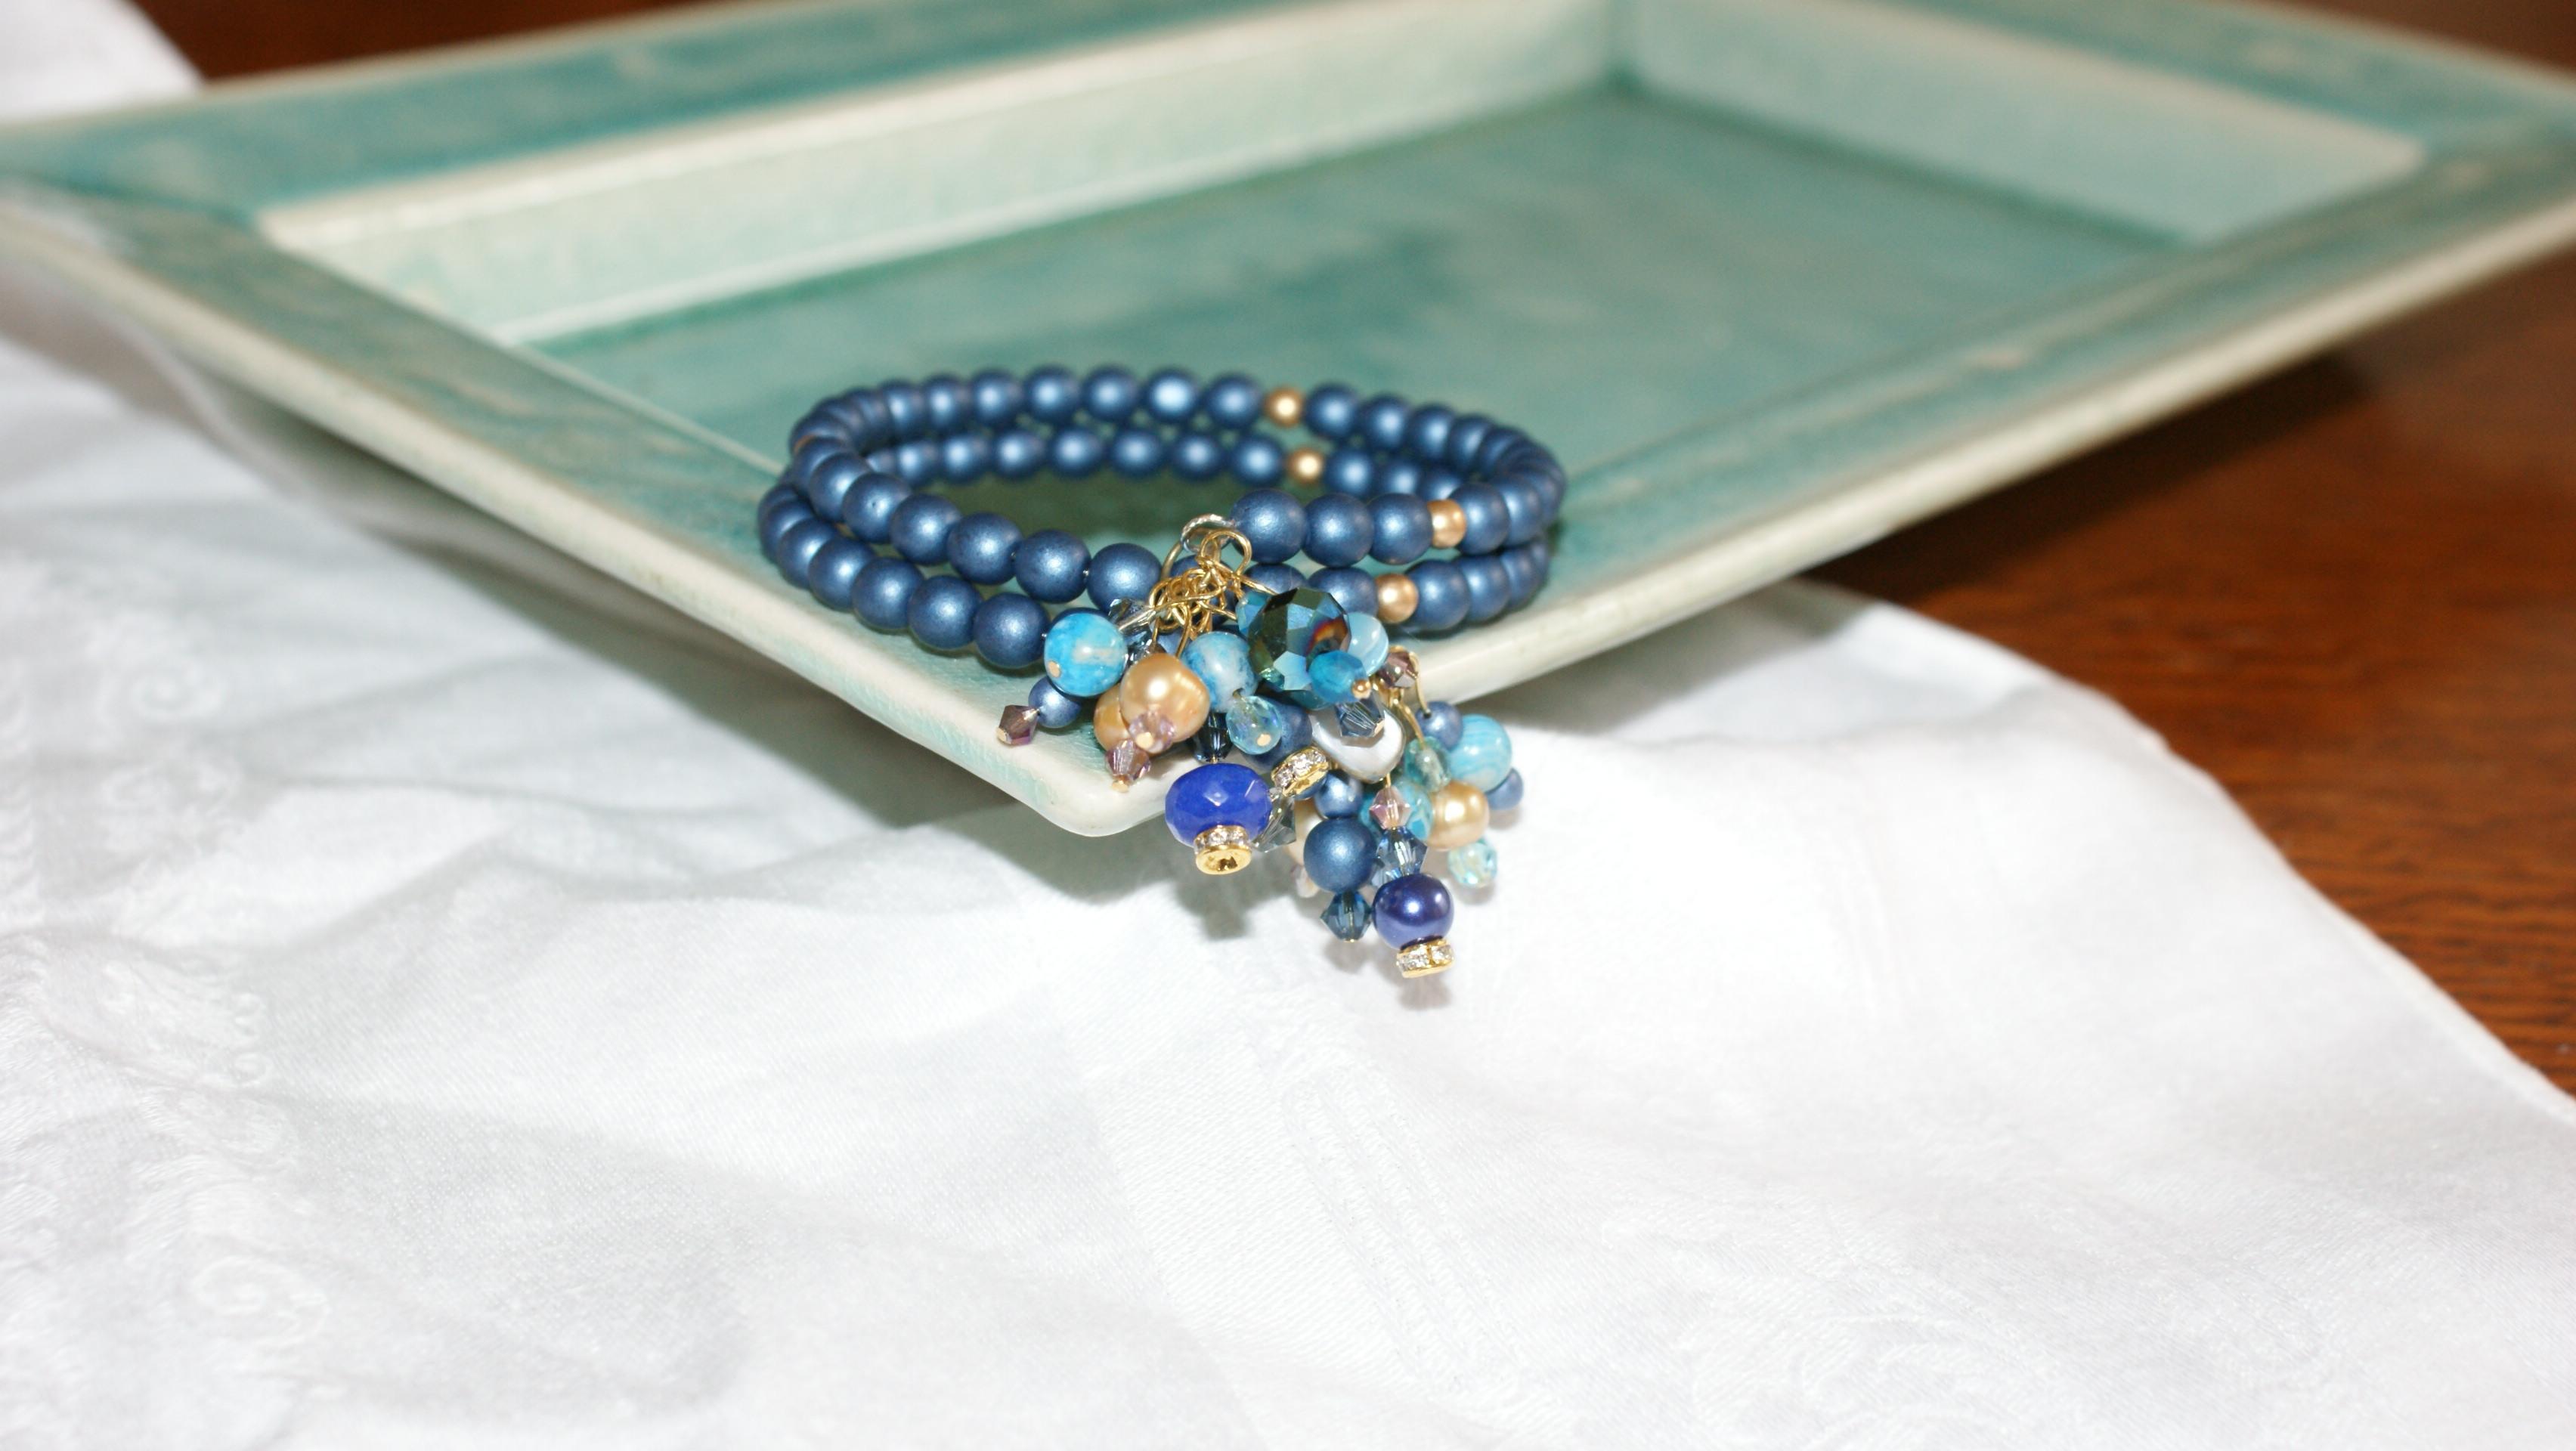 Blue bracelet with dangles